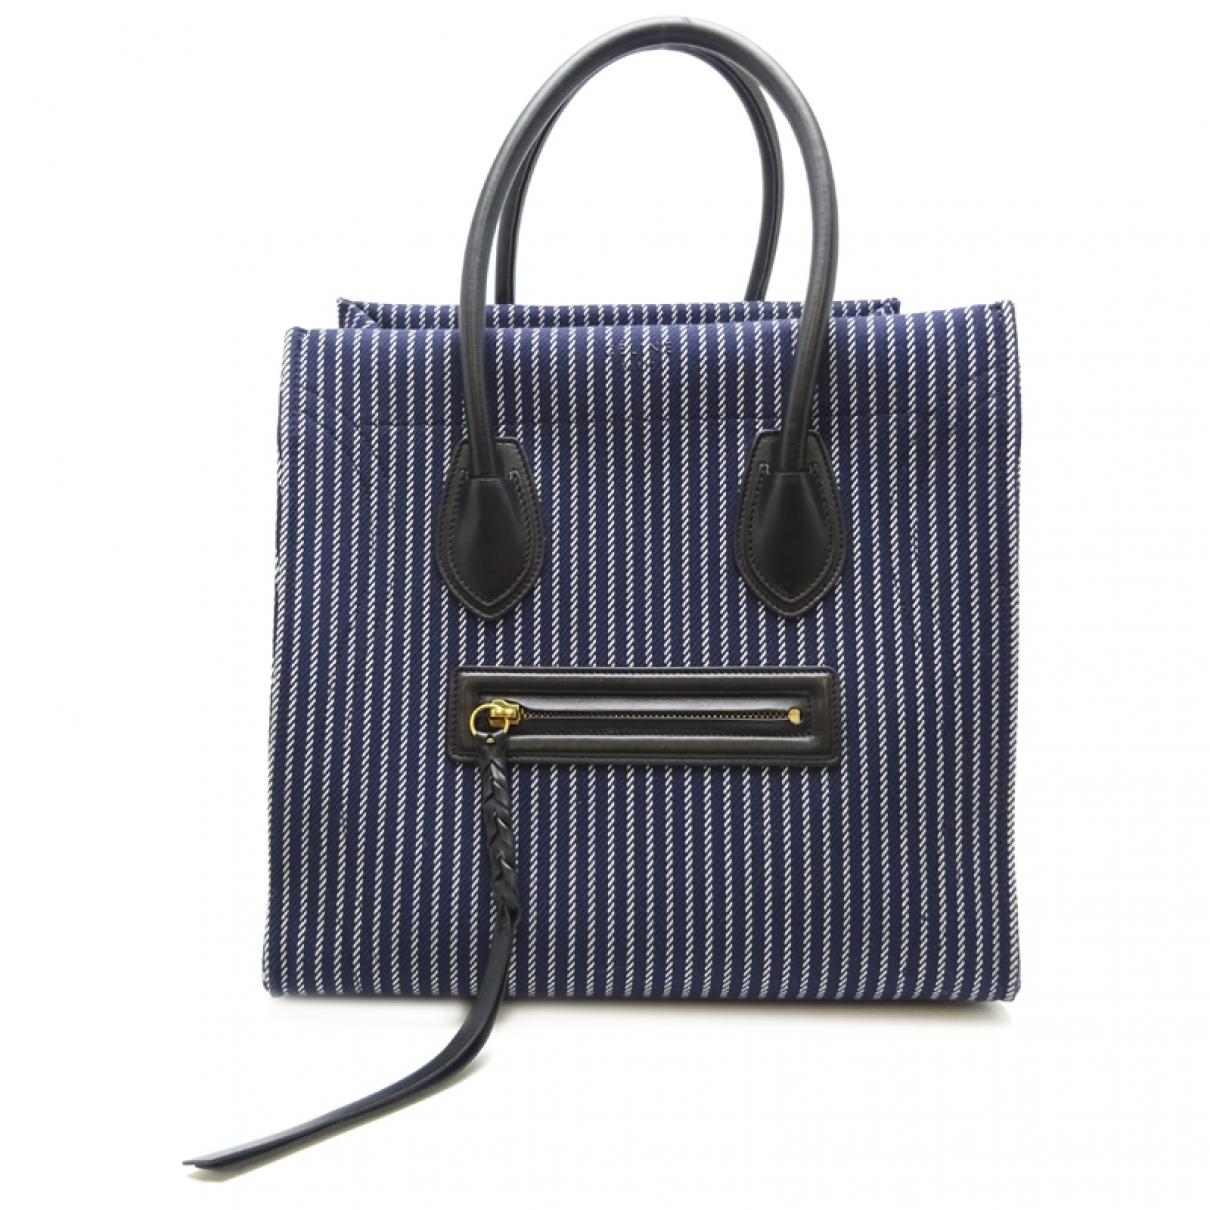 Celine Luggage Phantom Navy Cloth handbag for Women \N